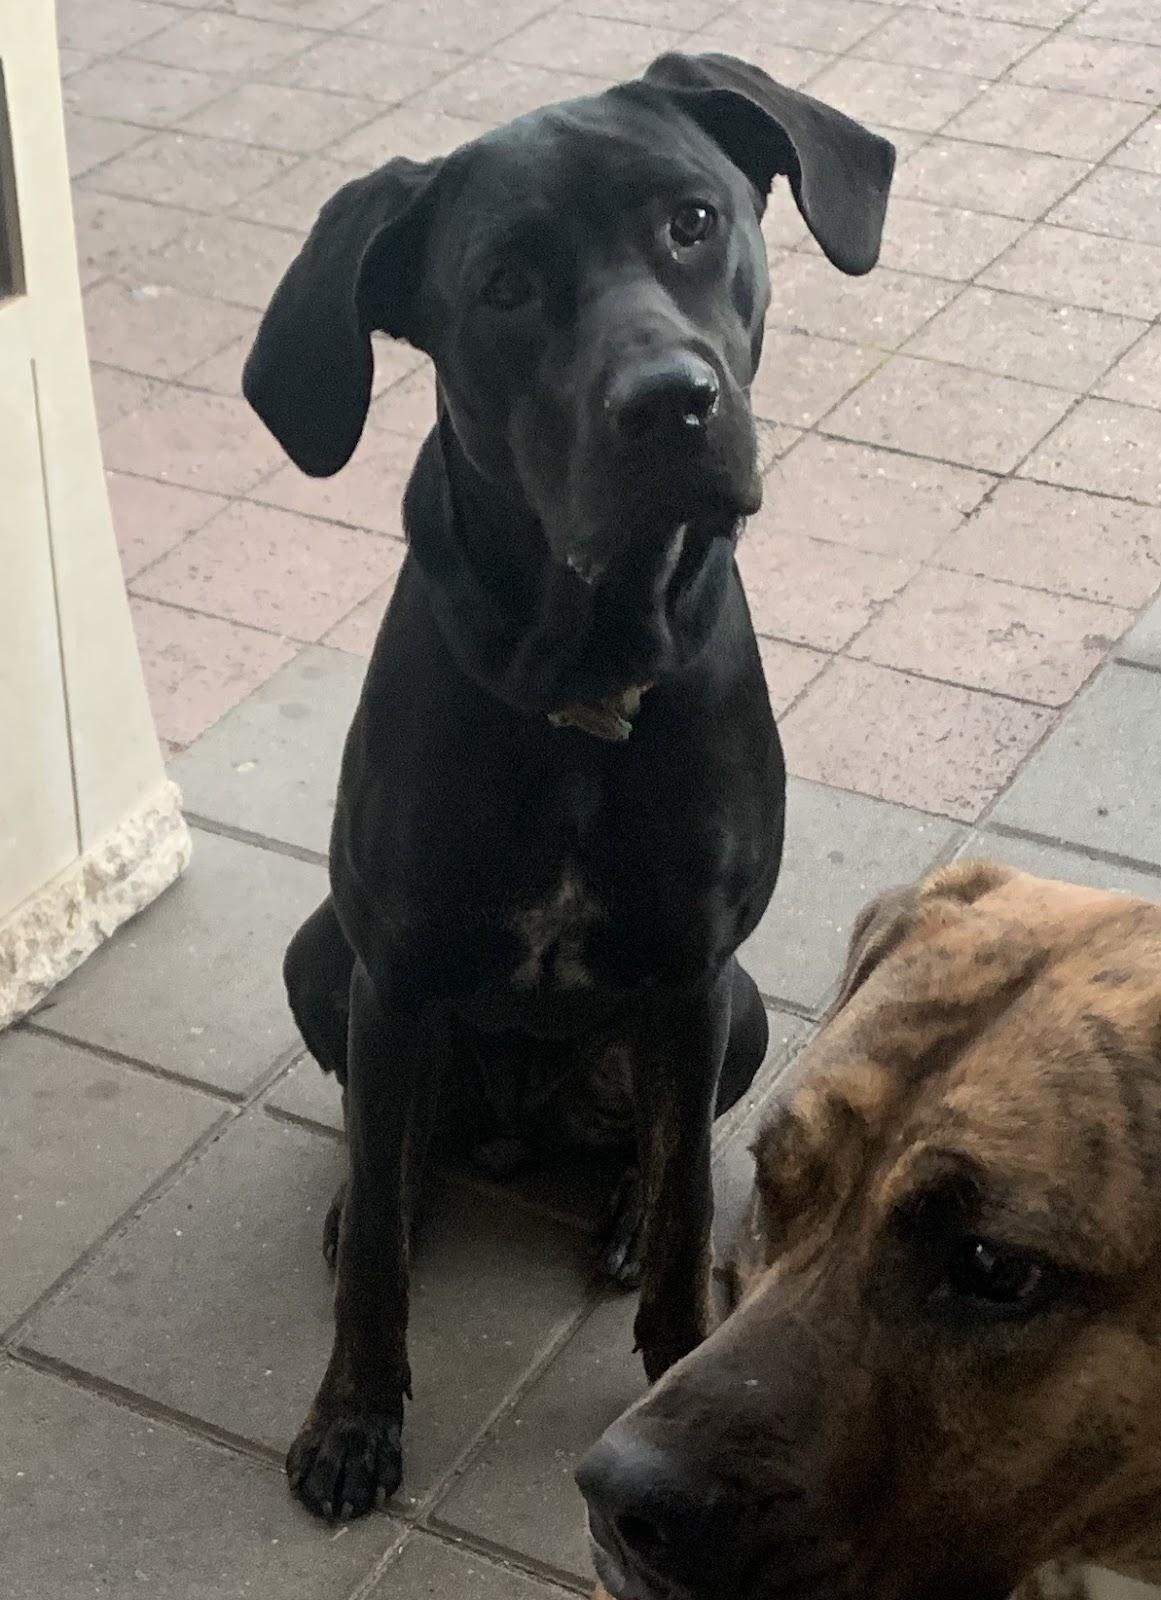 Dog mastino napolitano x sabian defence dog x cane corso